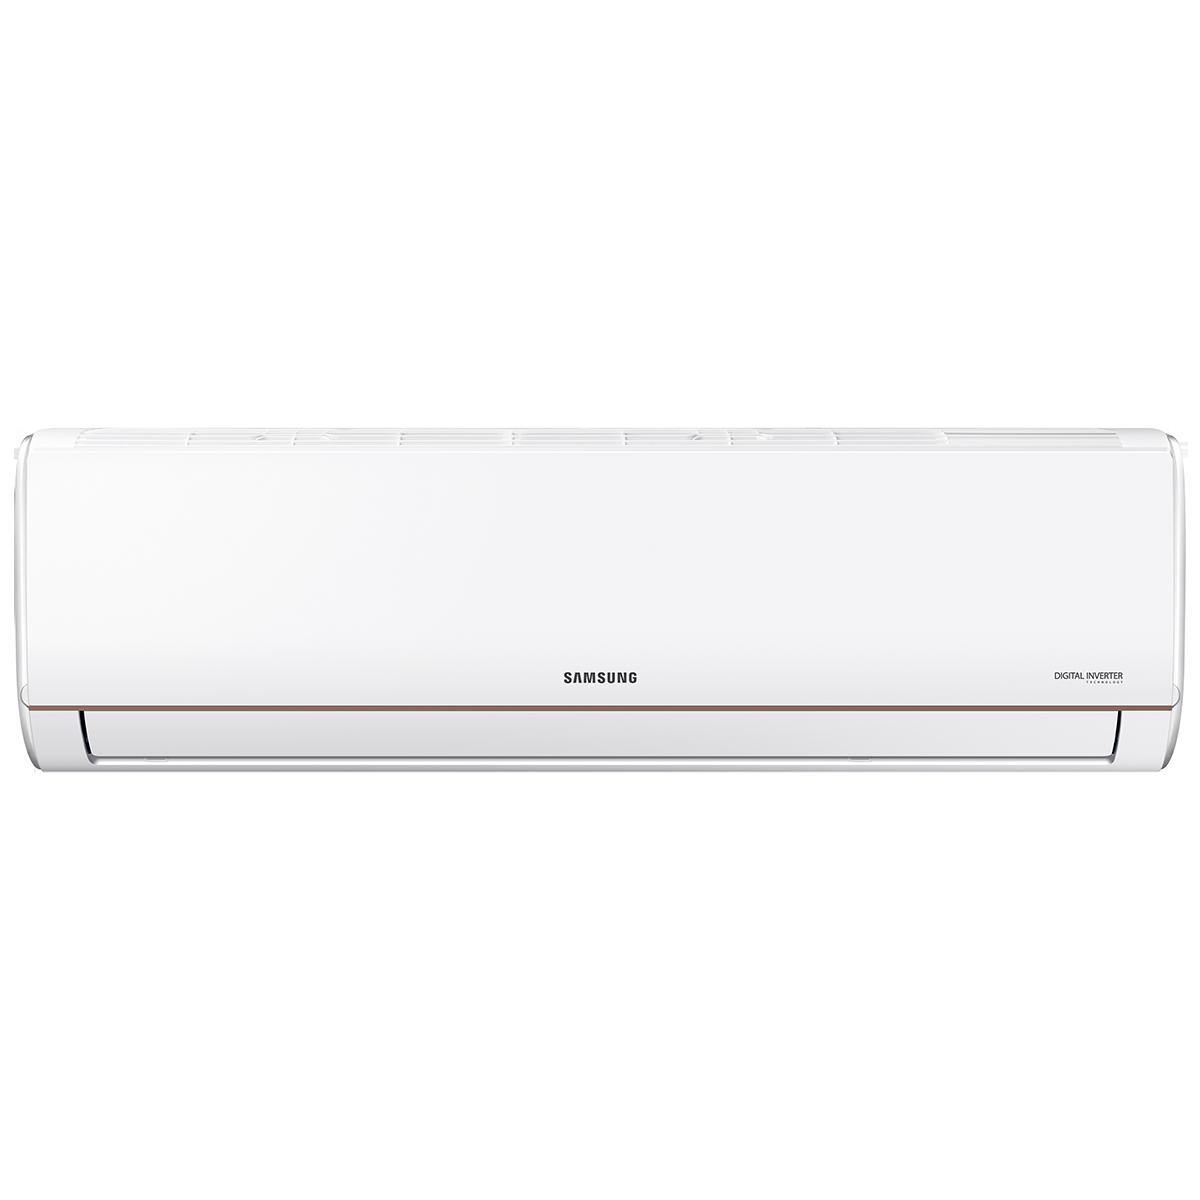 Samsung 1 Ton 3 Star Inverter Split AC (Copper Condenser, AR12TY3QCBR, White)_1